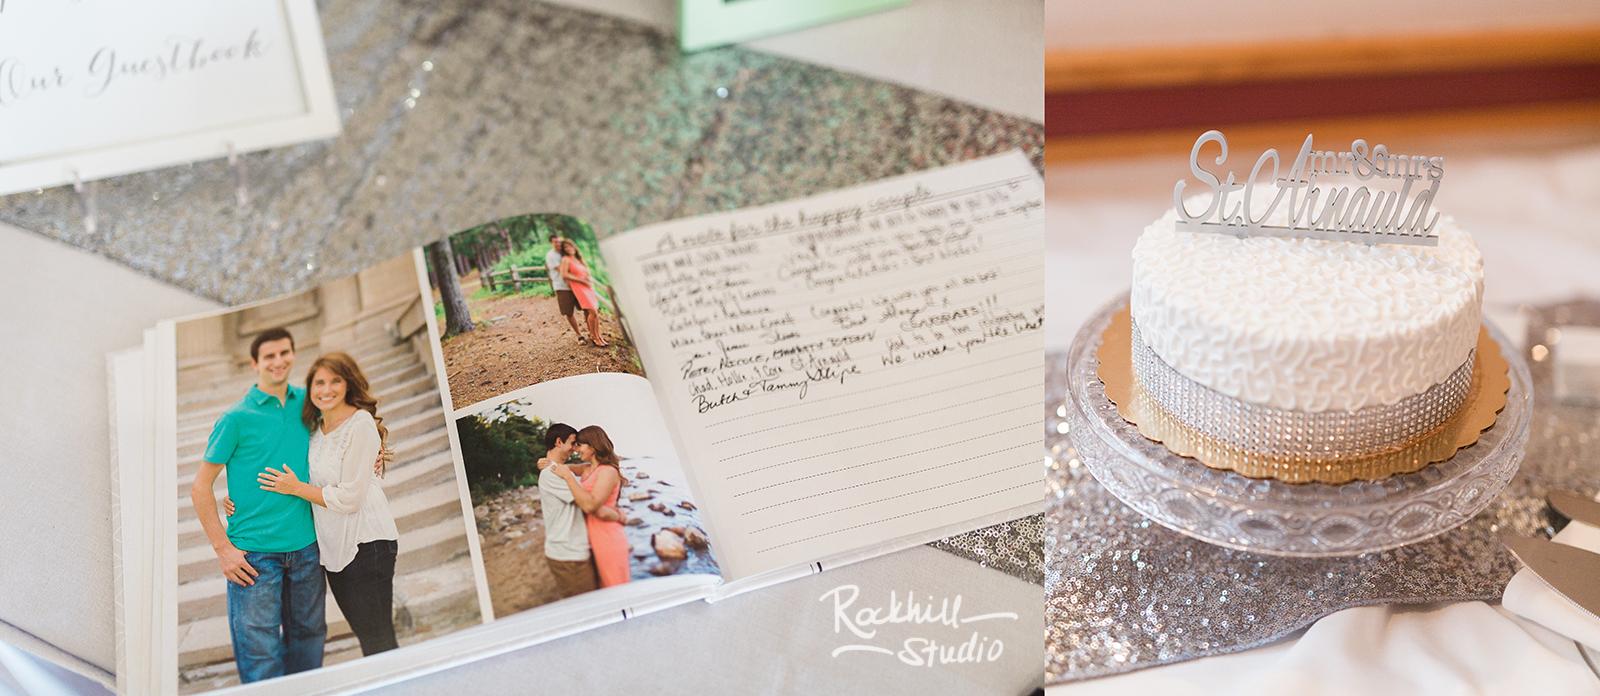 marquette-wedding-upper-peninsula-northern-michigan-wedding-ck-photography-ramada-17.jpg